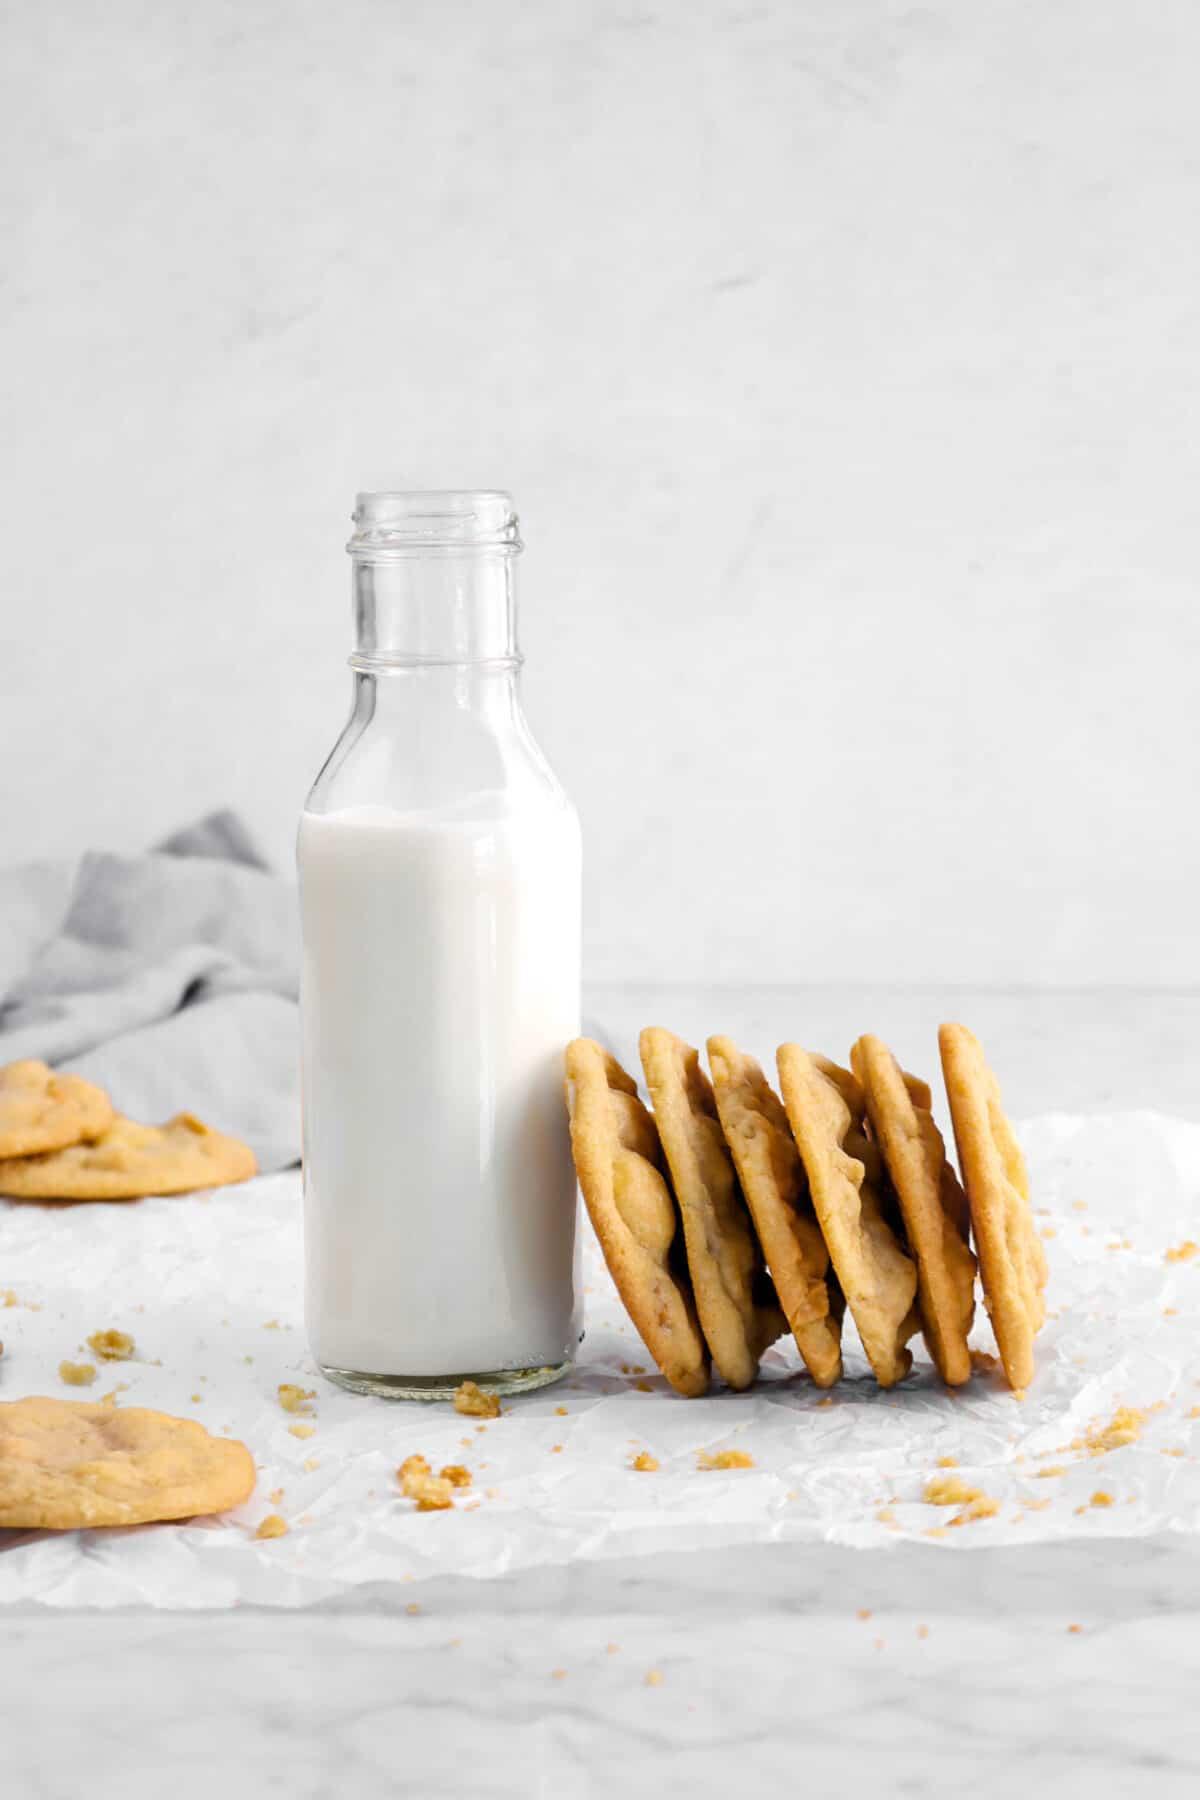 white chocolate macadamia nut cookies leaning against jar of milk